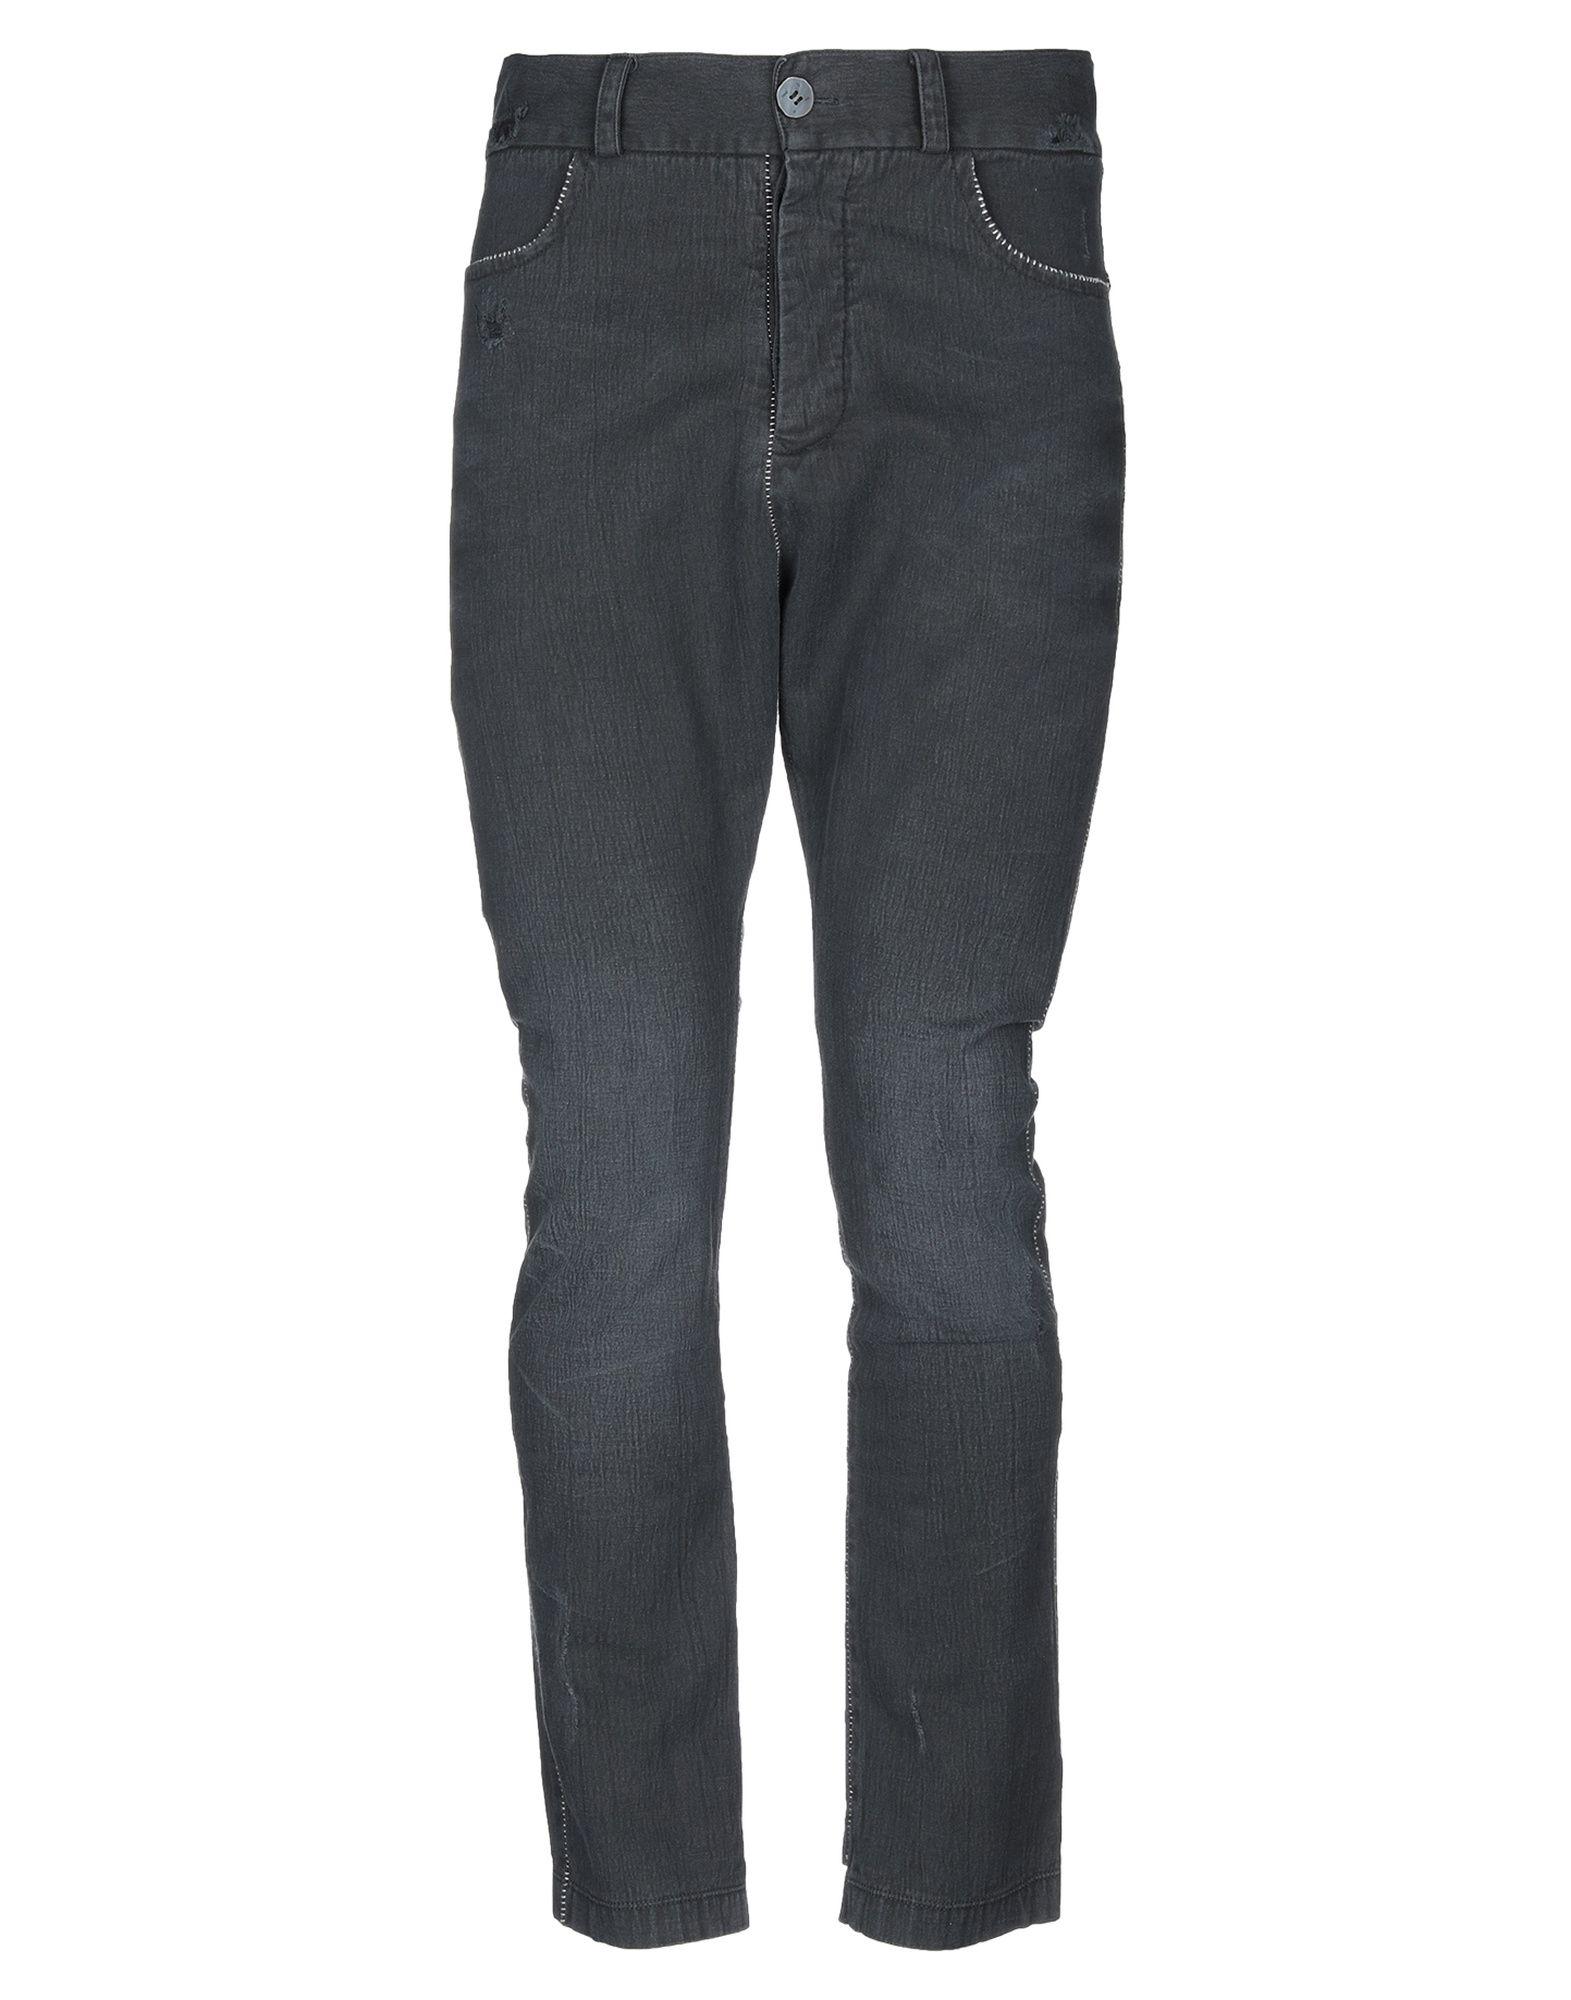 10SEI0OTTO Повседневные брюки 10sei0otto палантин